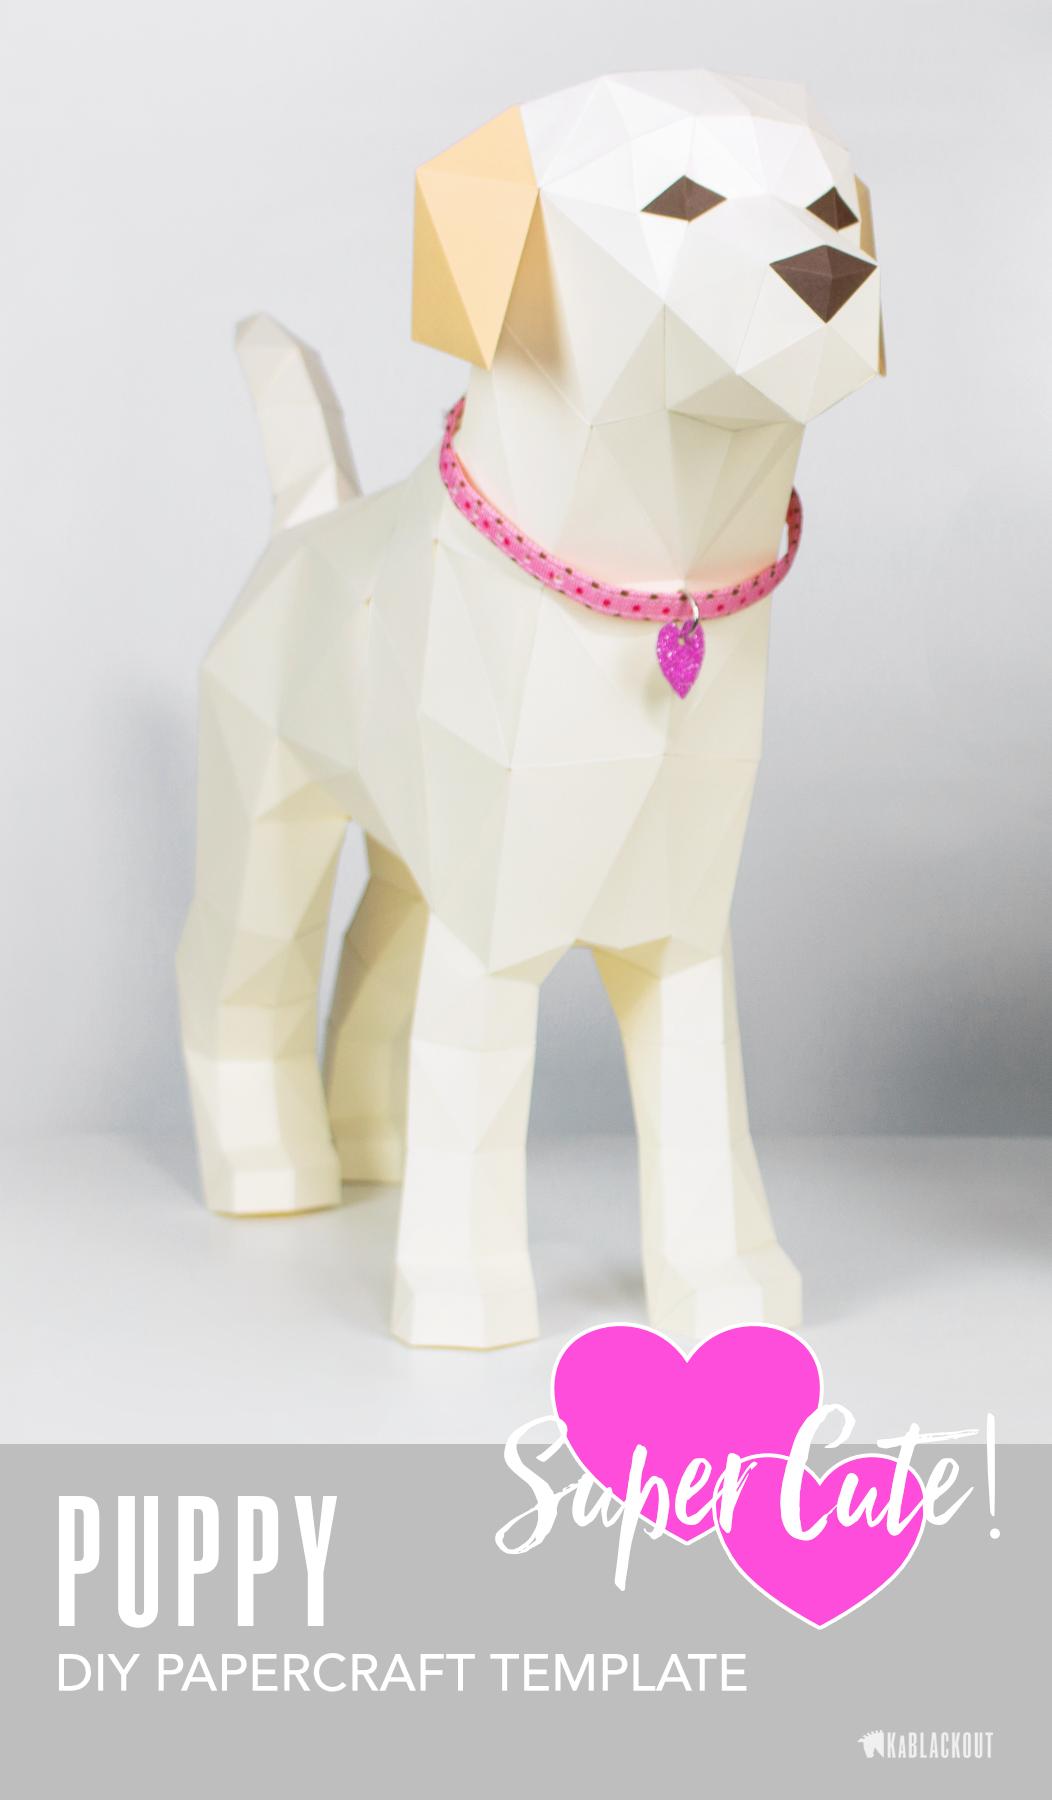 Puppy Papercraft Template Create An Adorable Free Standing Sculpture Of A Sweet Little